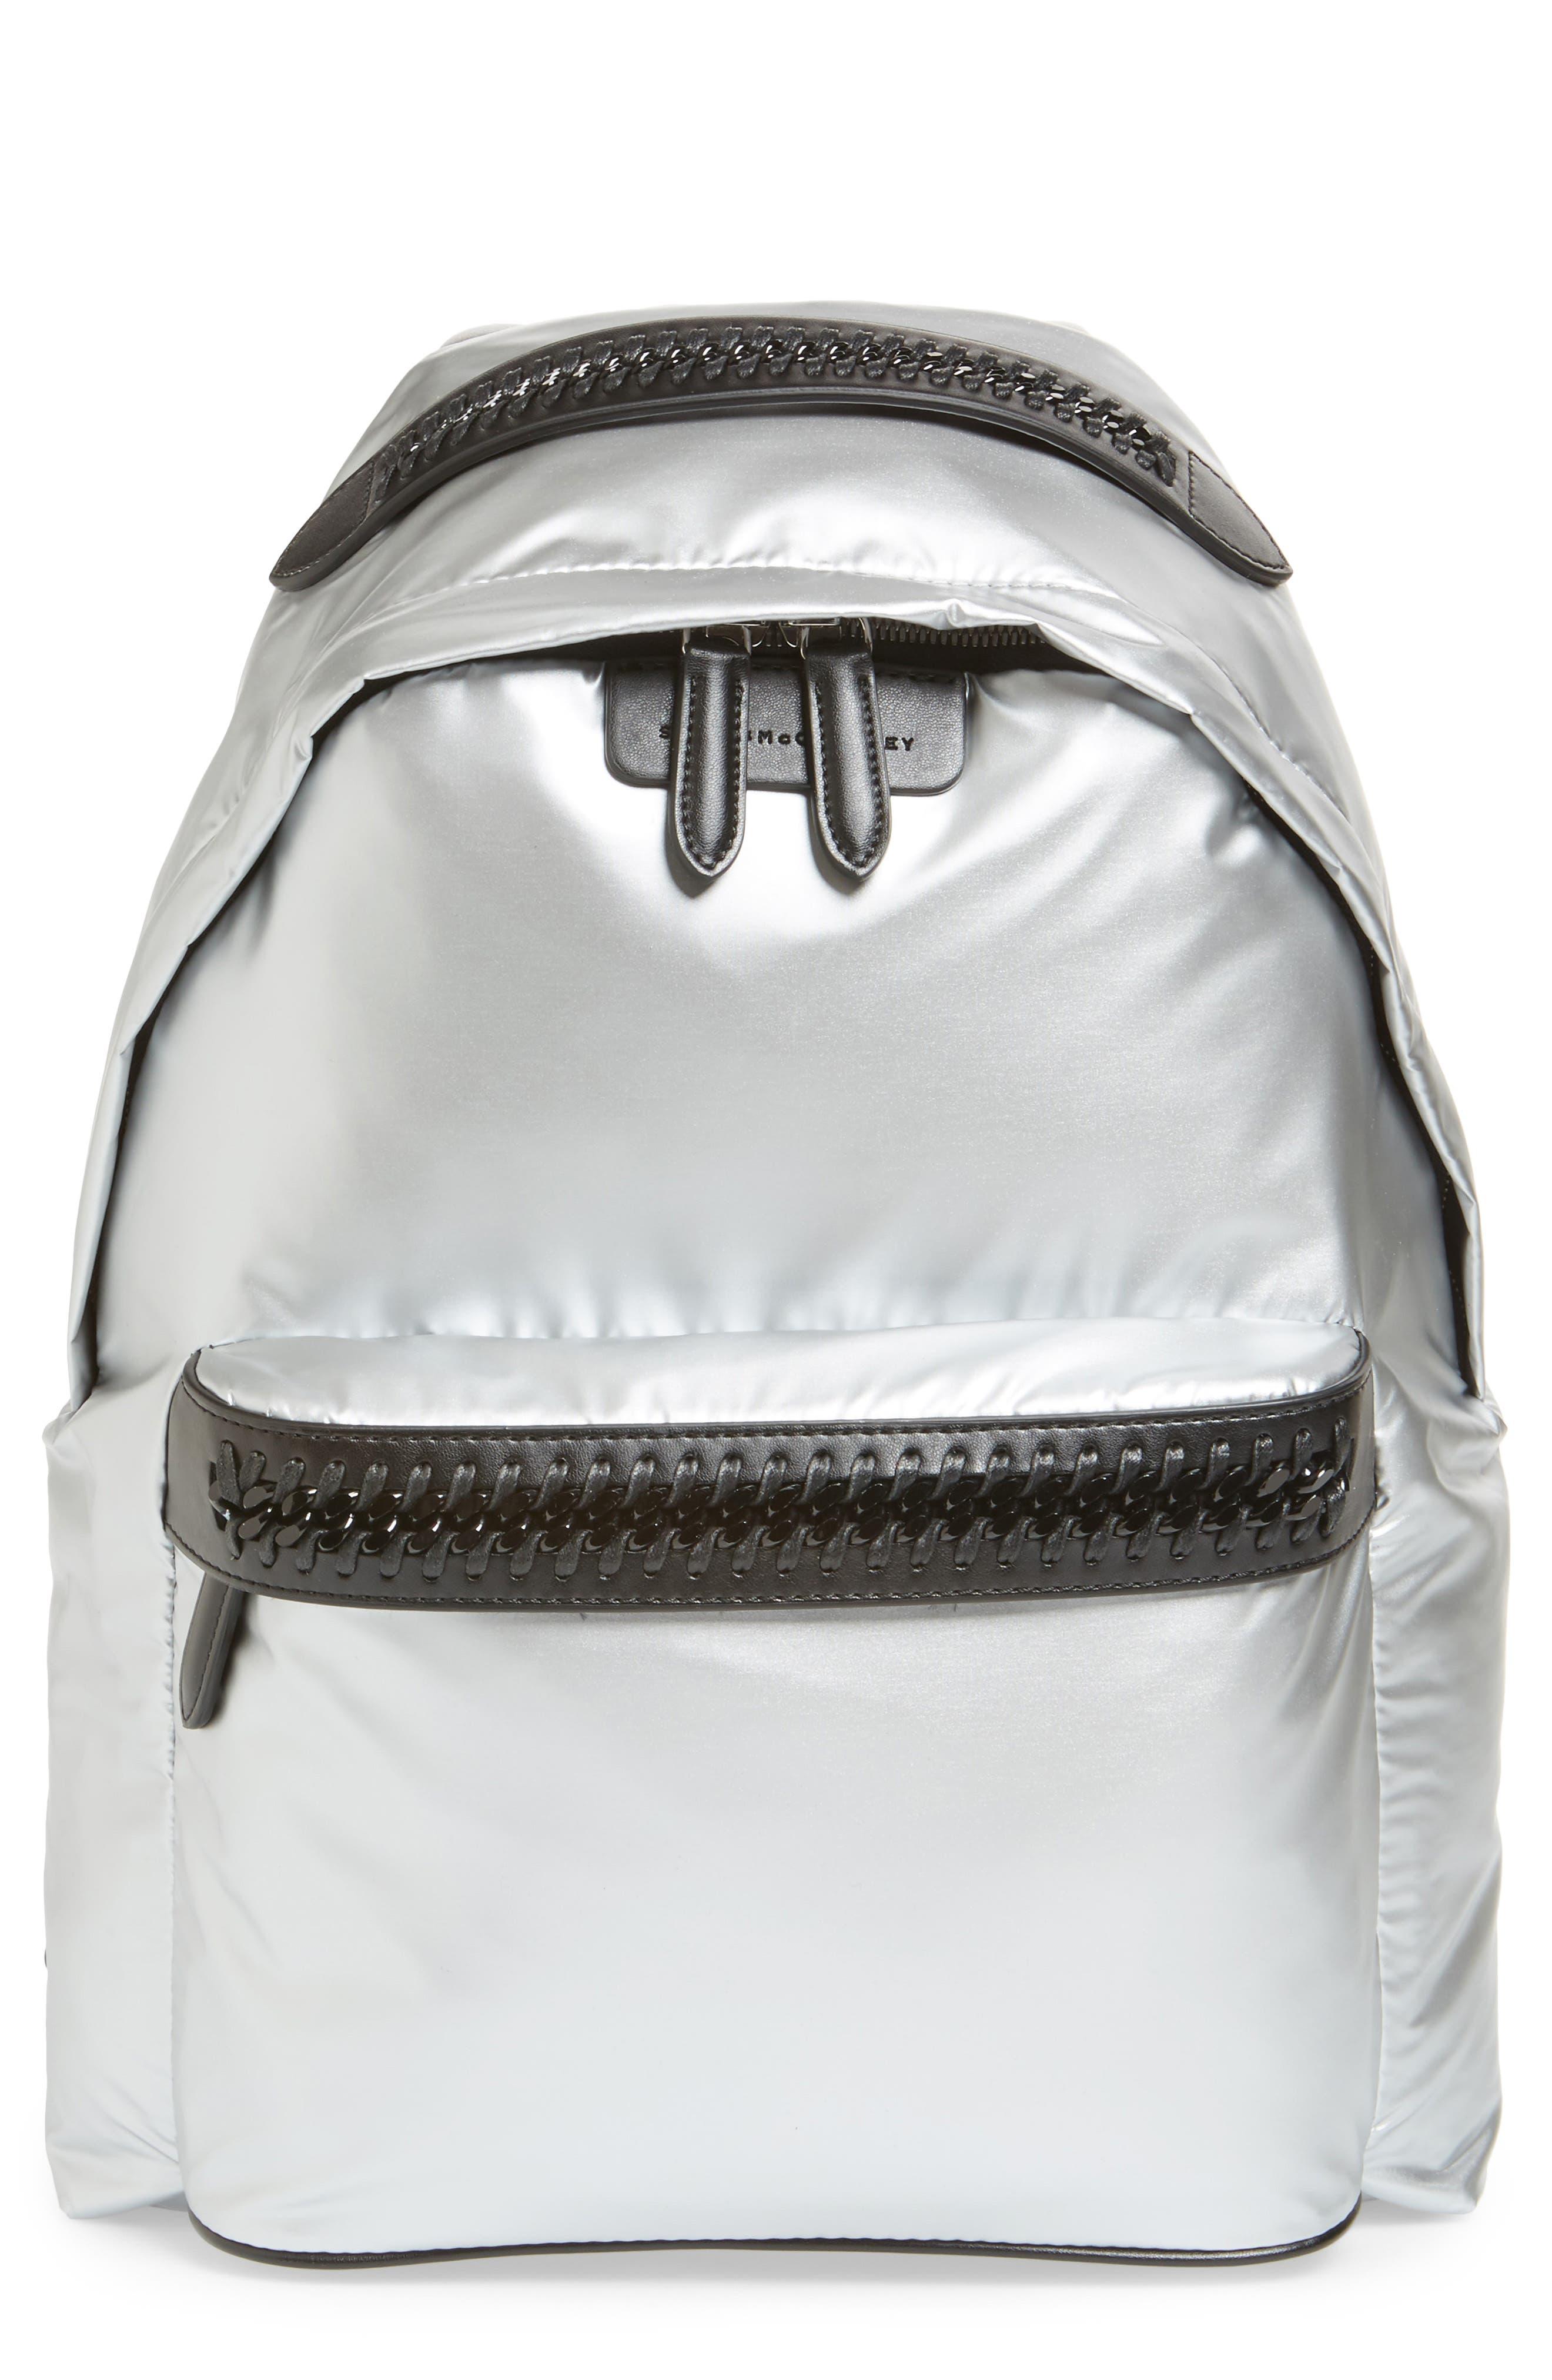 Alternate Image 1 Selected - Stella McCartney Falabella Metallic Nylon Backpack